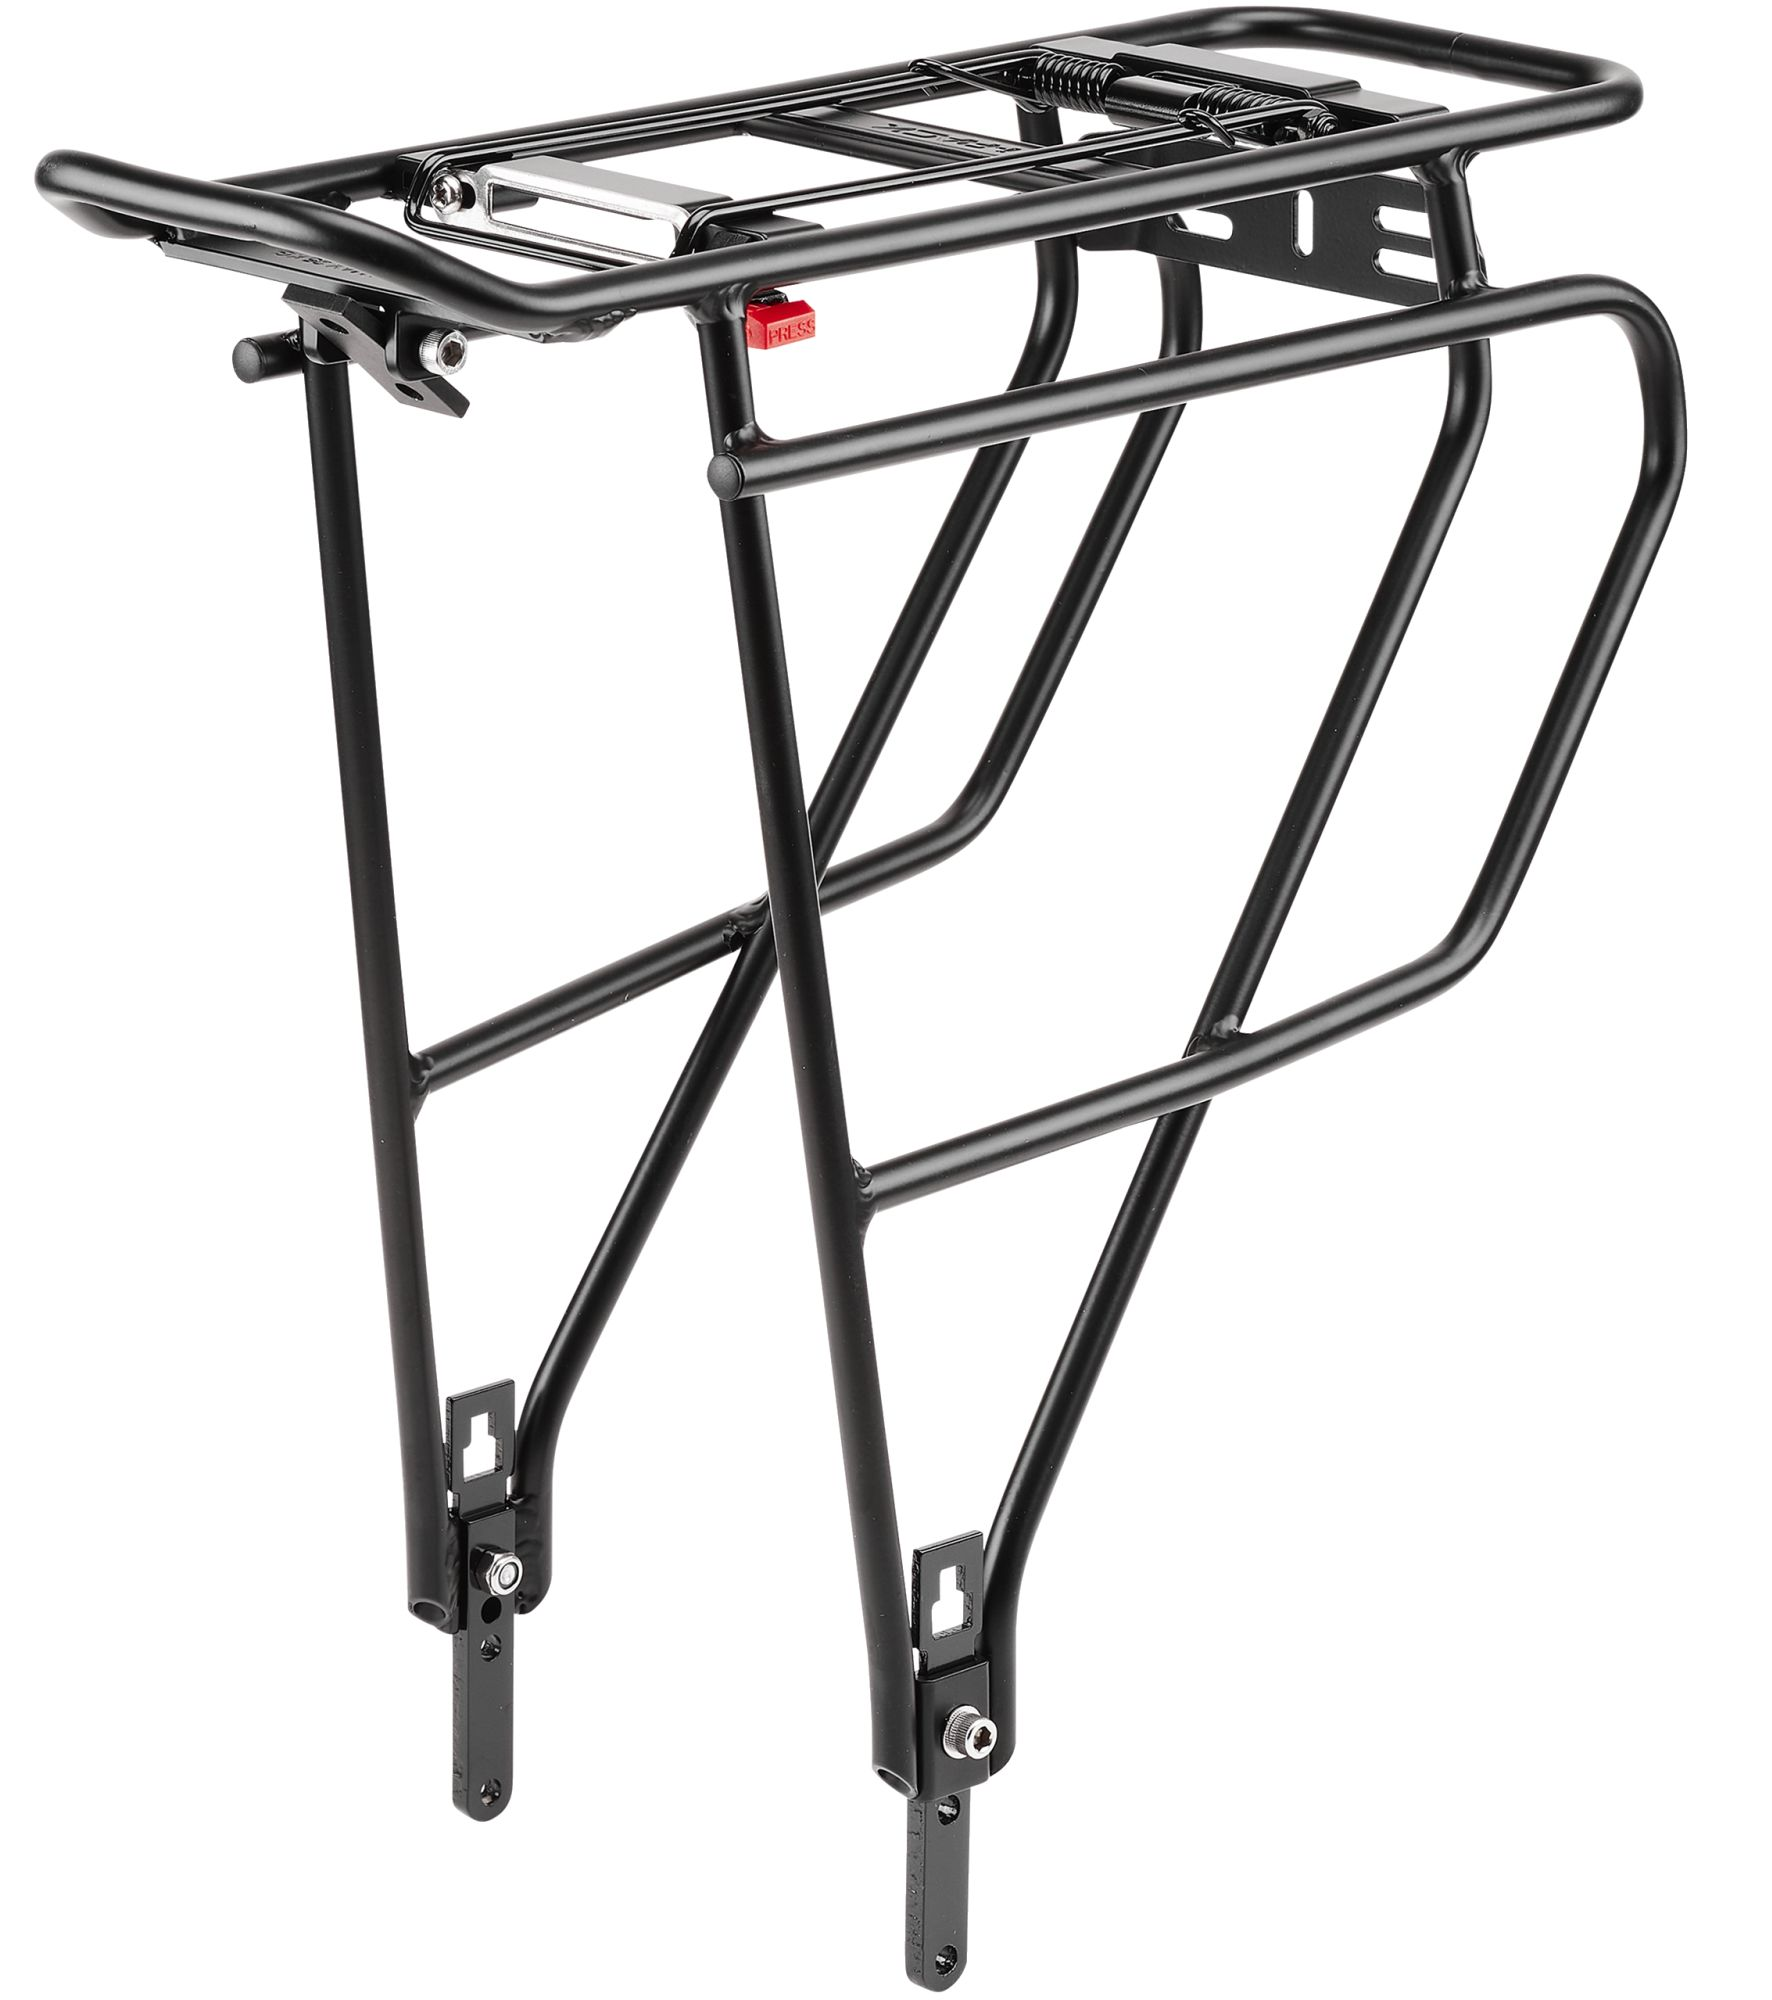 Fahrradteile/Gepäckträger: Standwell  Gepäckträger i-Rack II 26-28 Zoll 25 KG 26-28 Zoll